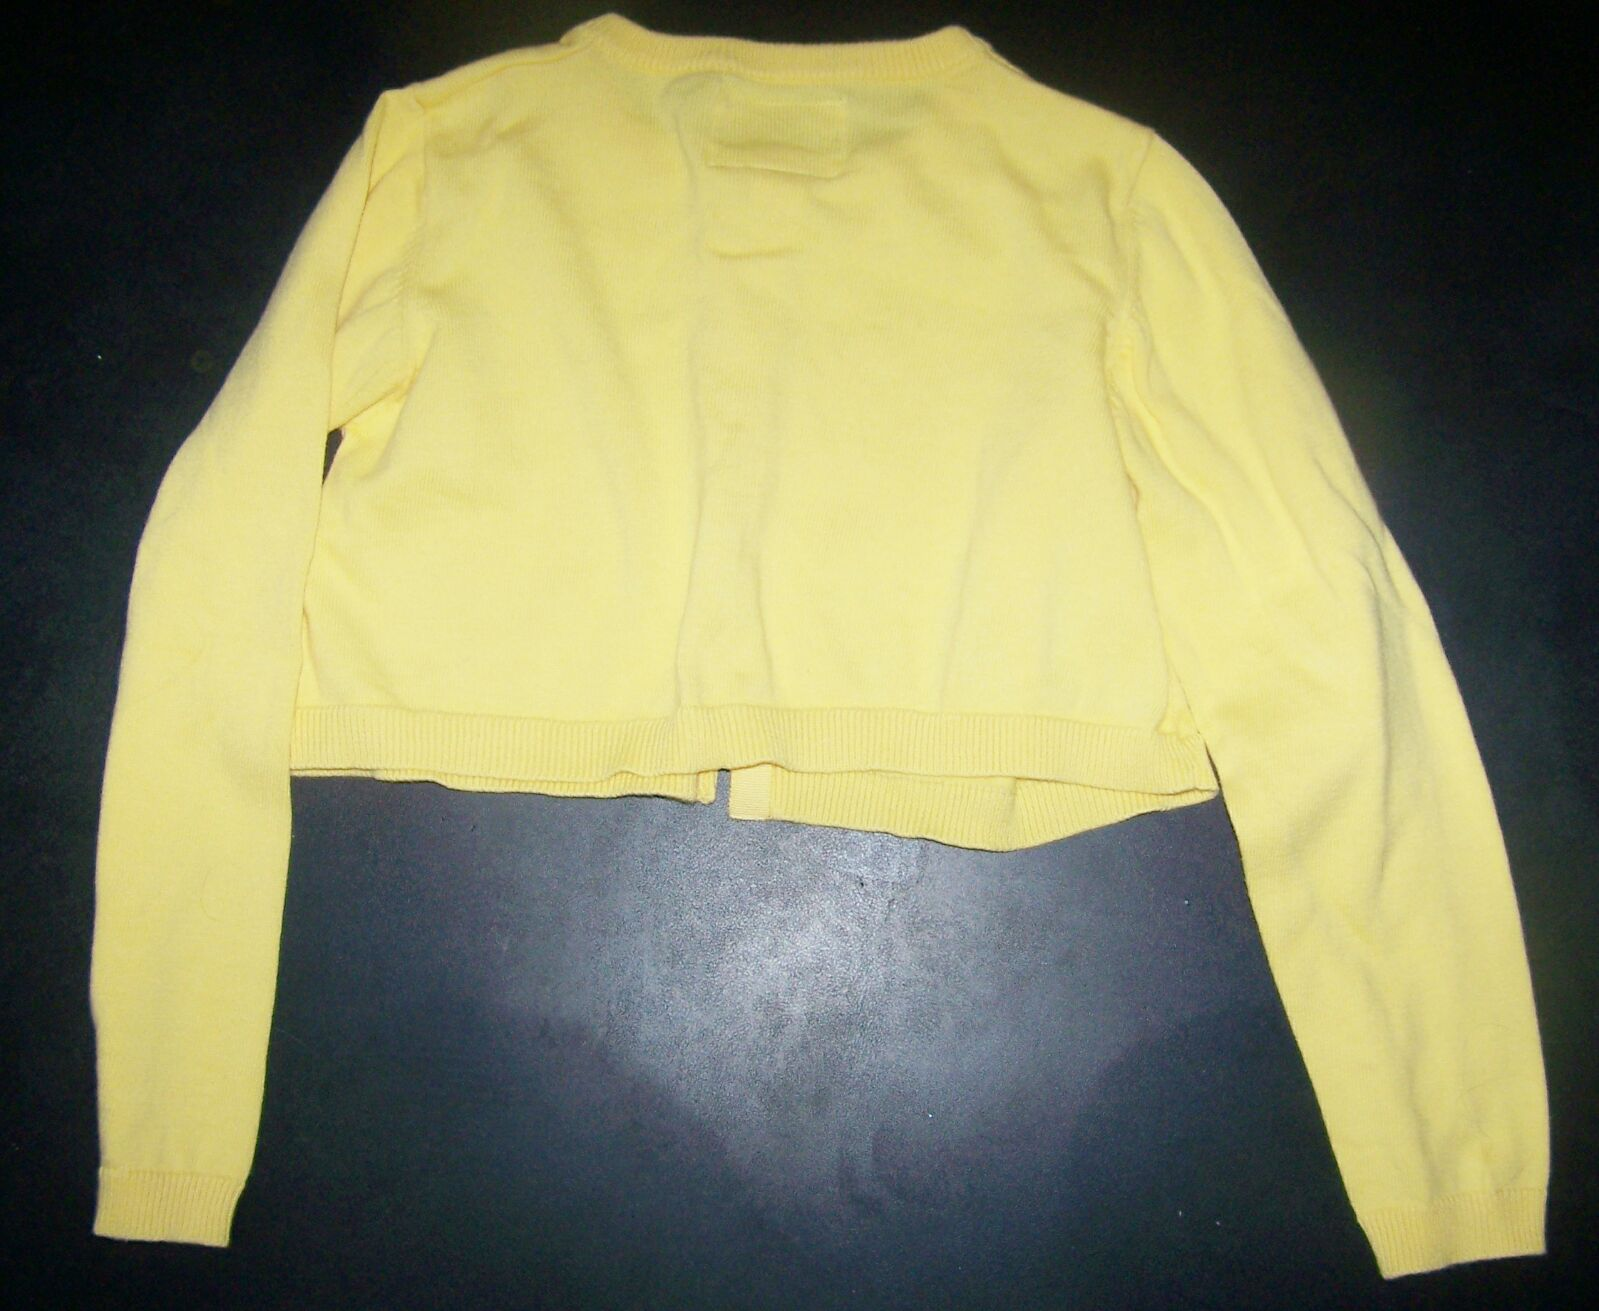 Girls yellow cardigan sweater sz 8 - Mercari: BUY & SELL THINGS ...